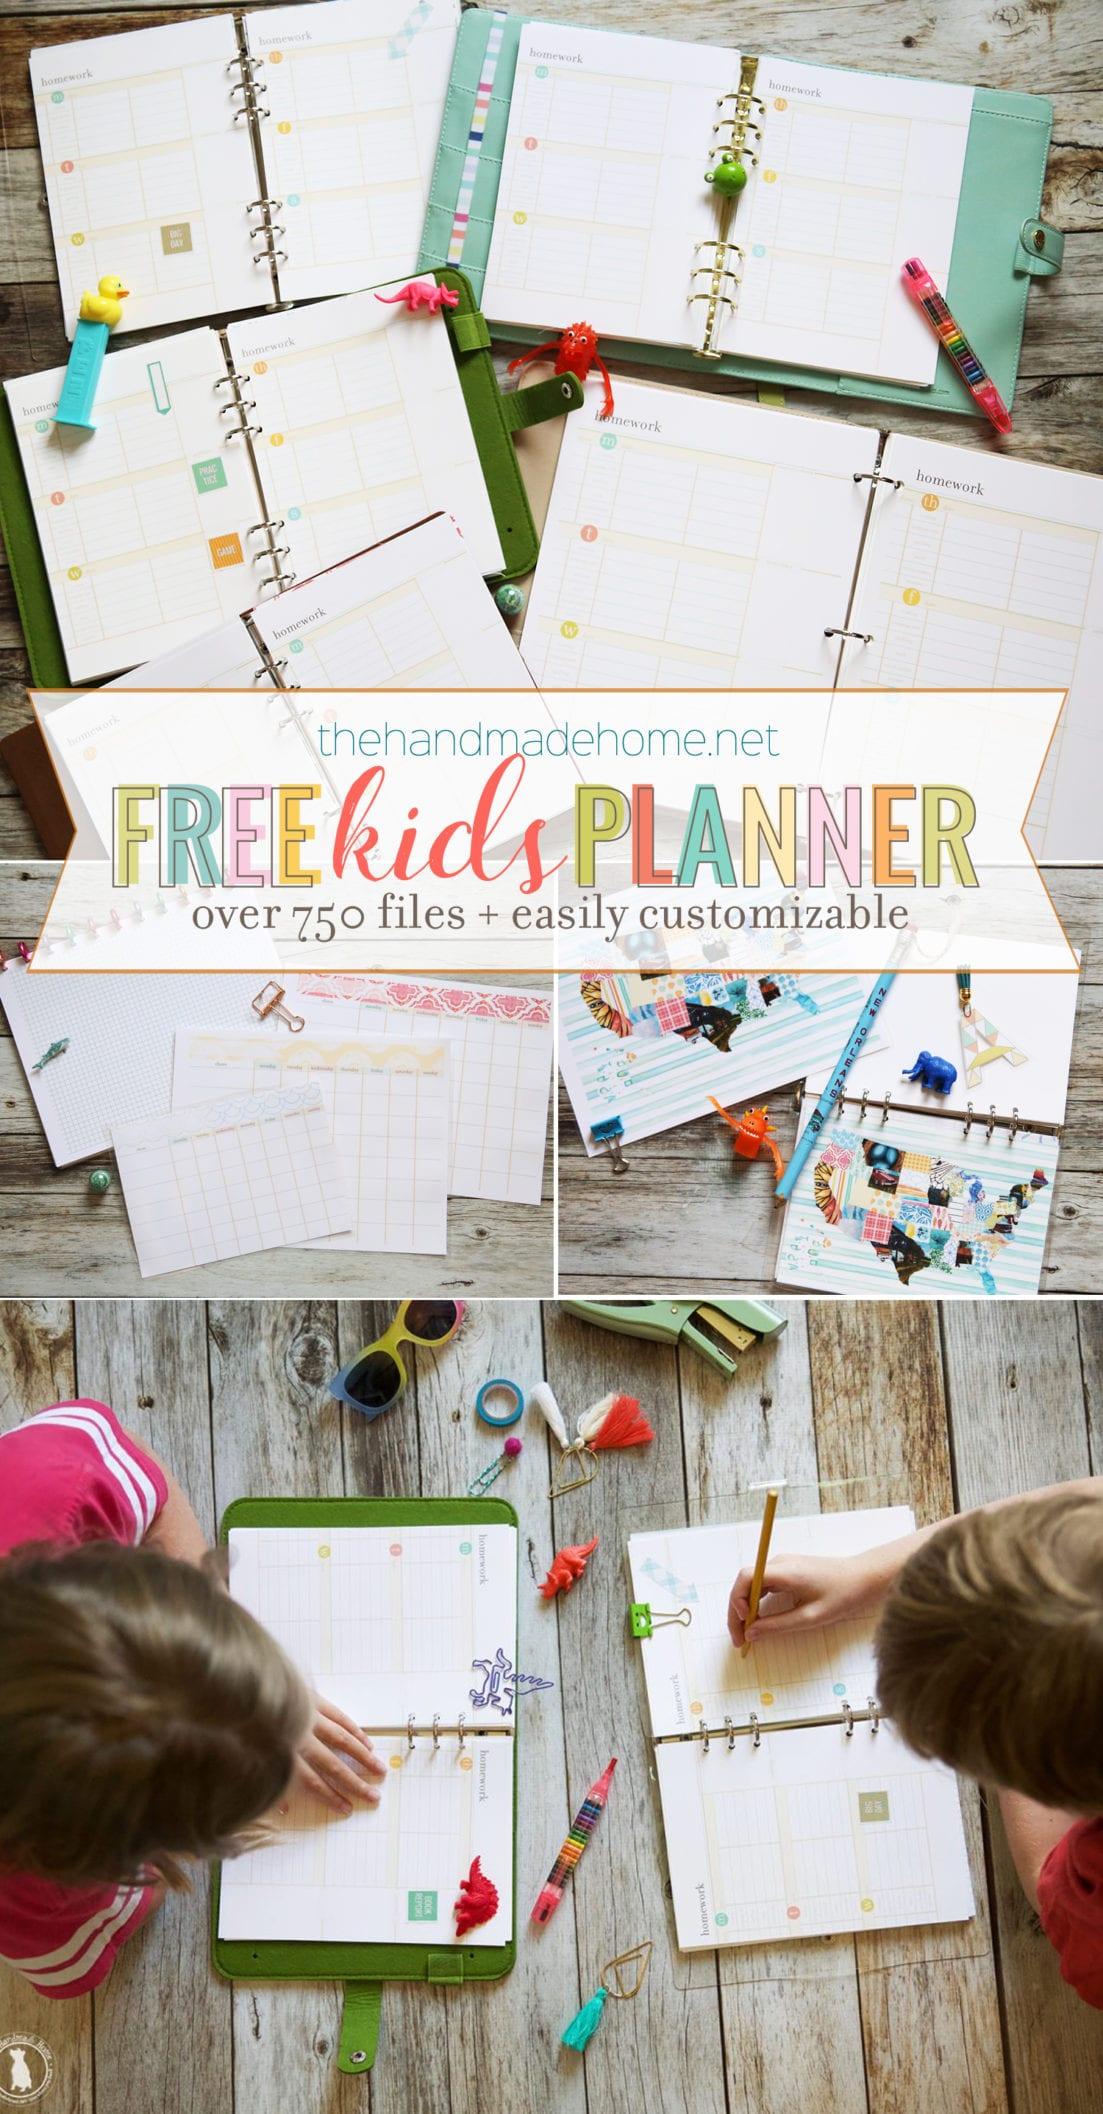 free kids planner 2020